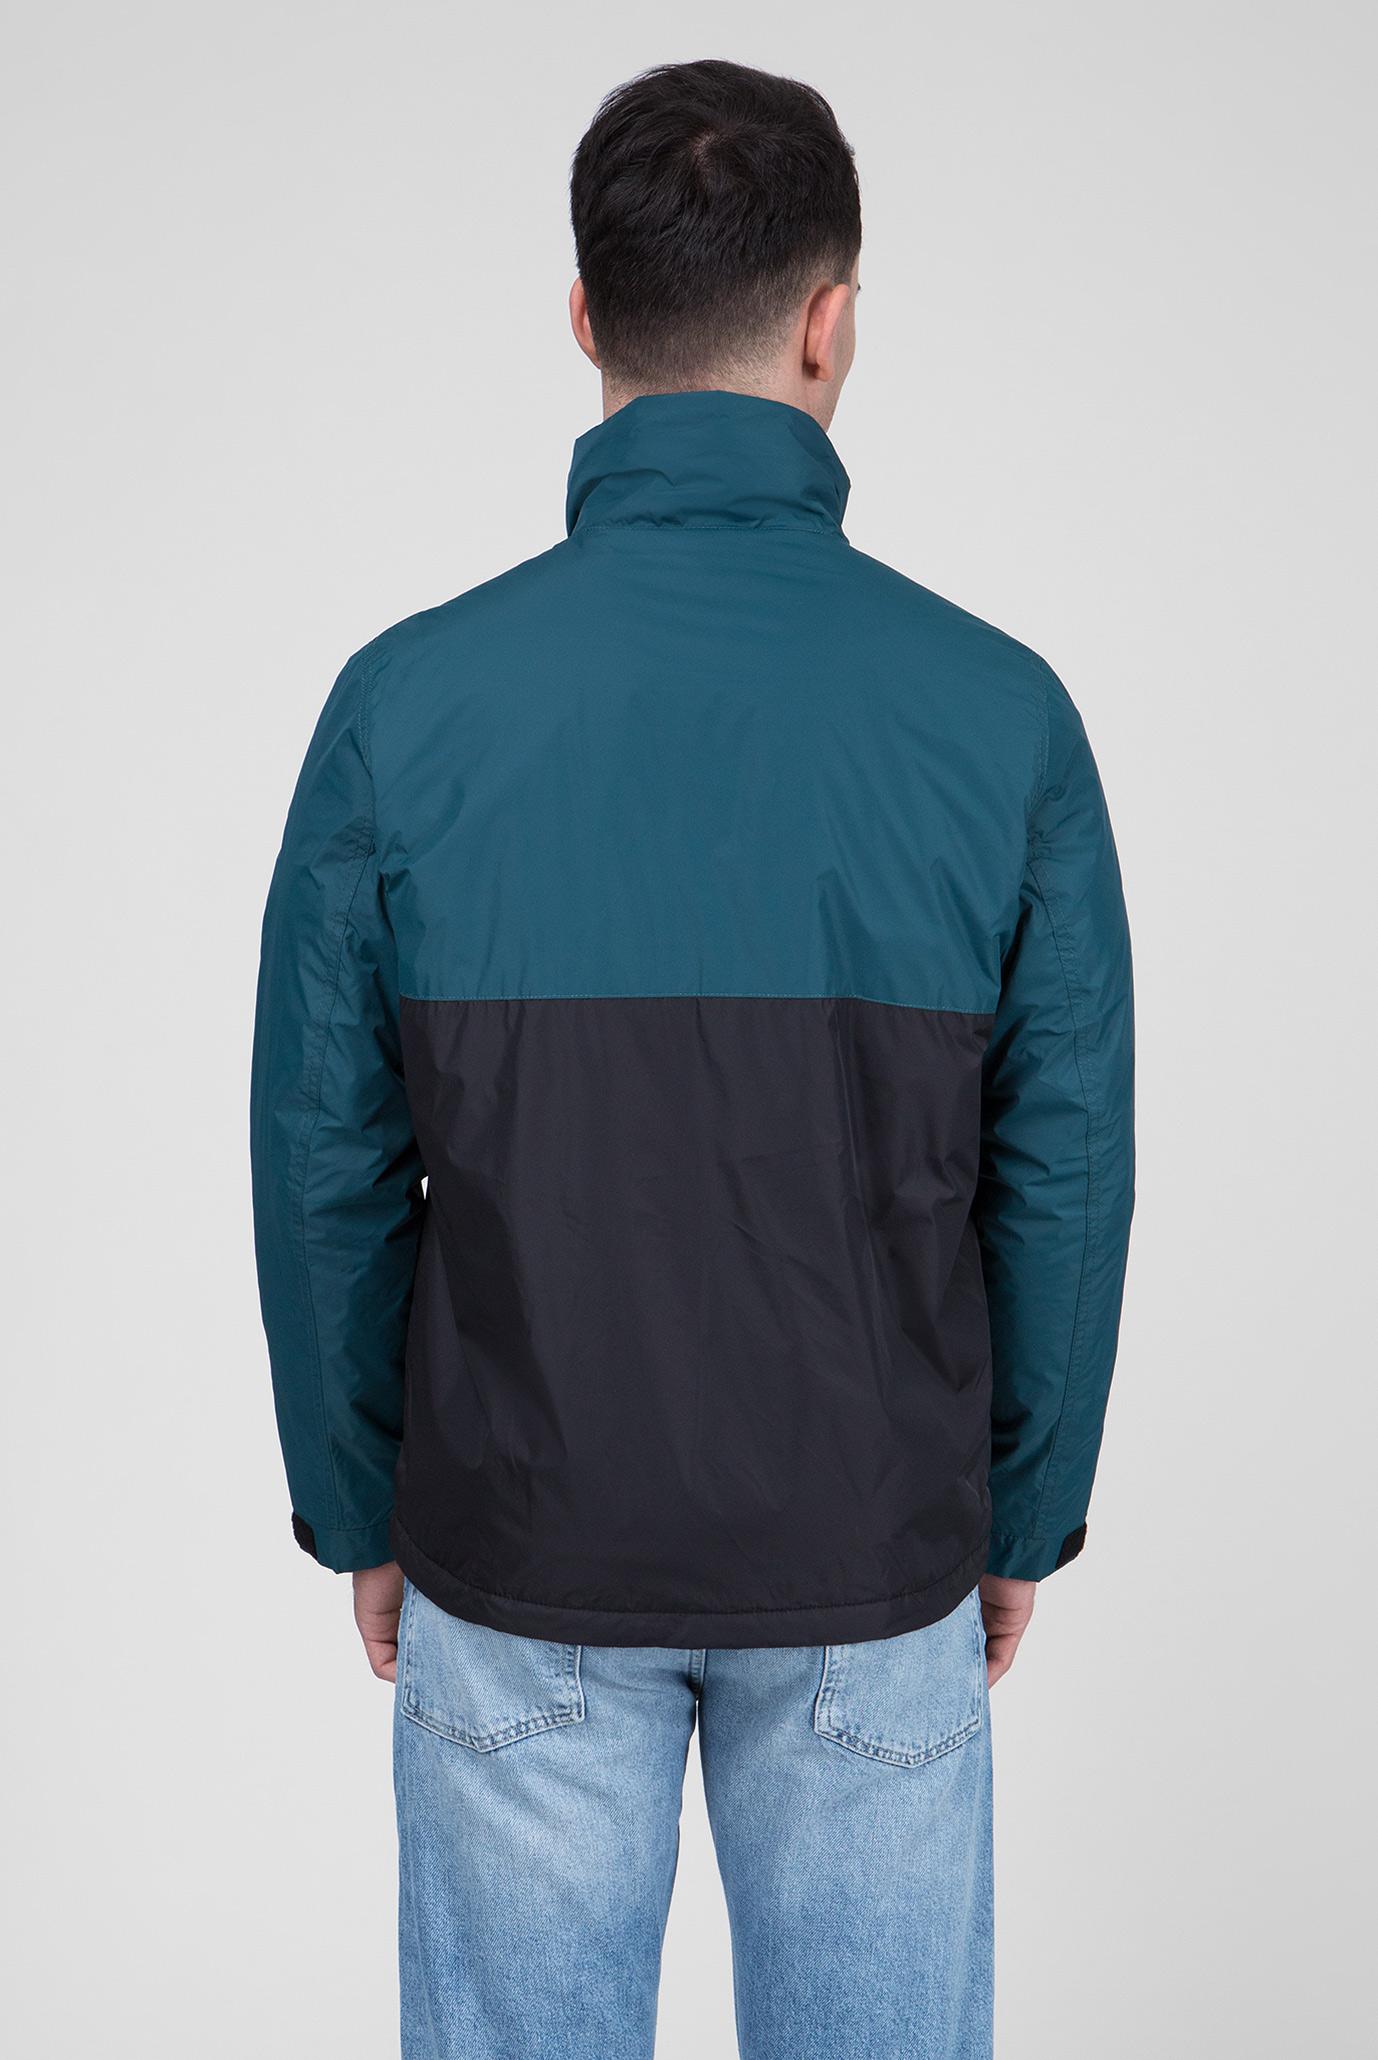 Купить Мужская зеленая куртка SAVAGE Pepe Jeans Pepe Jeans PM401921 – Киев, Украина. Цены в интернет магазине MD Fashion